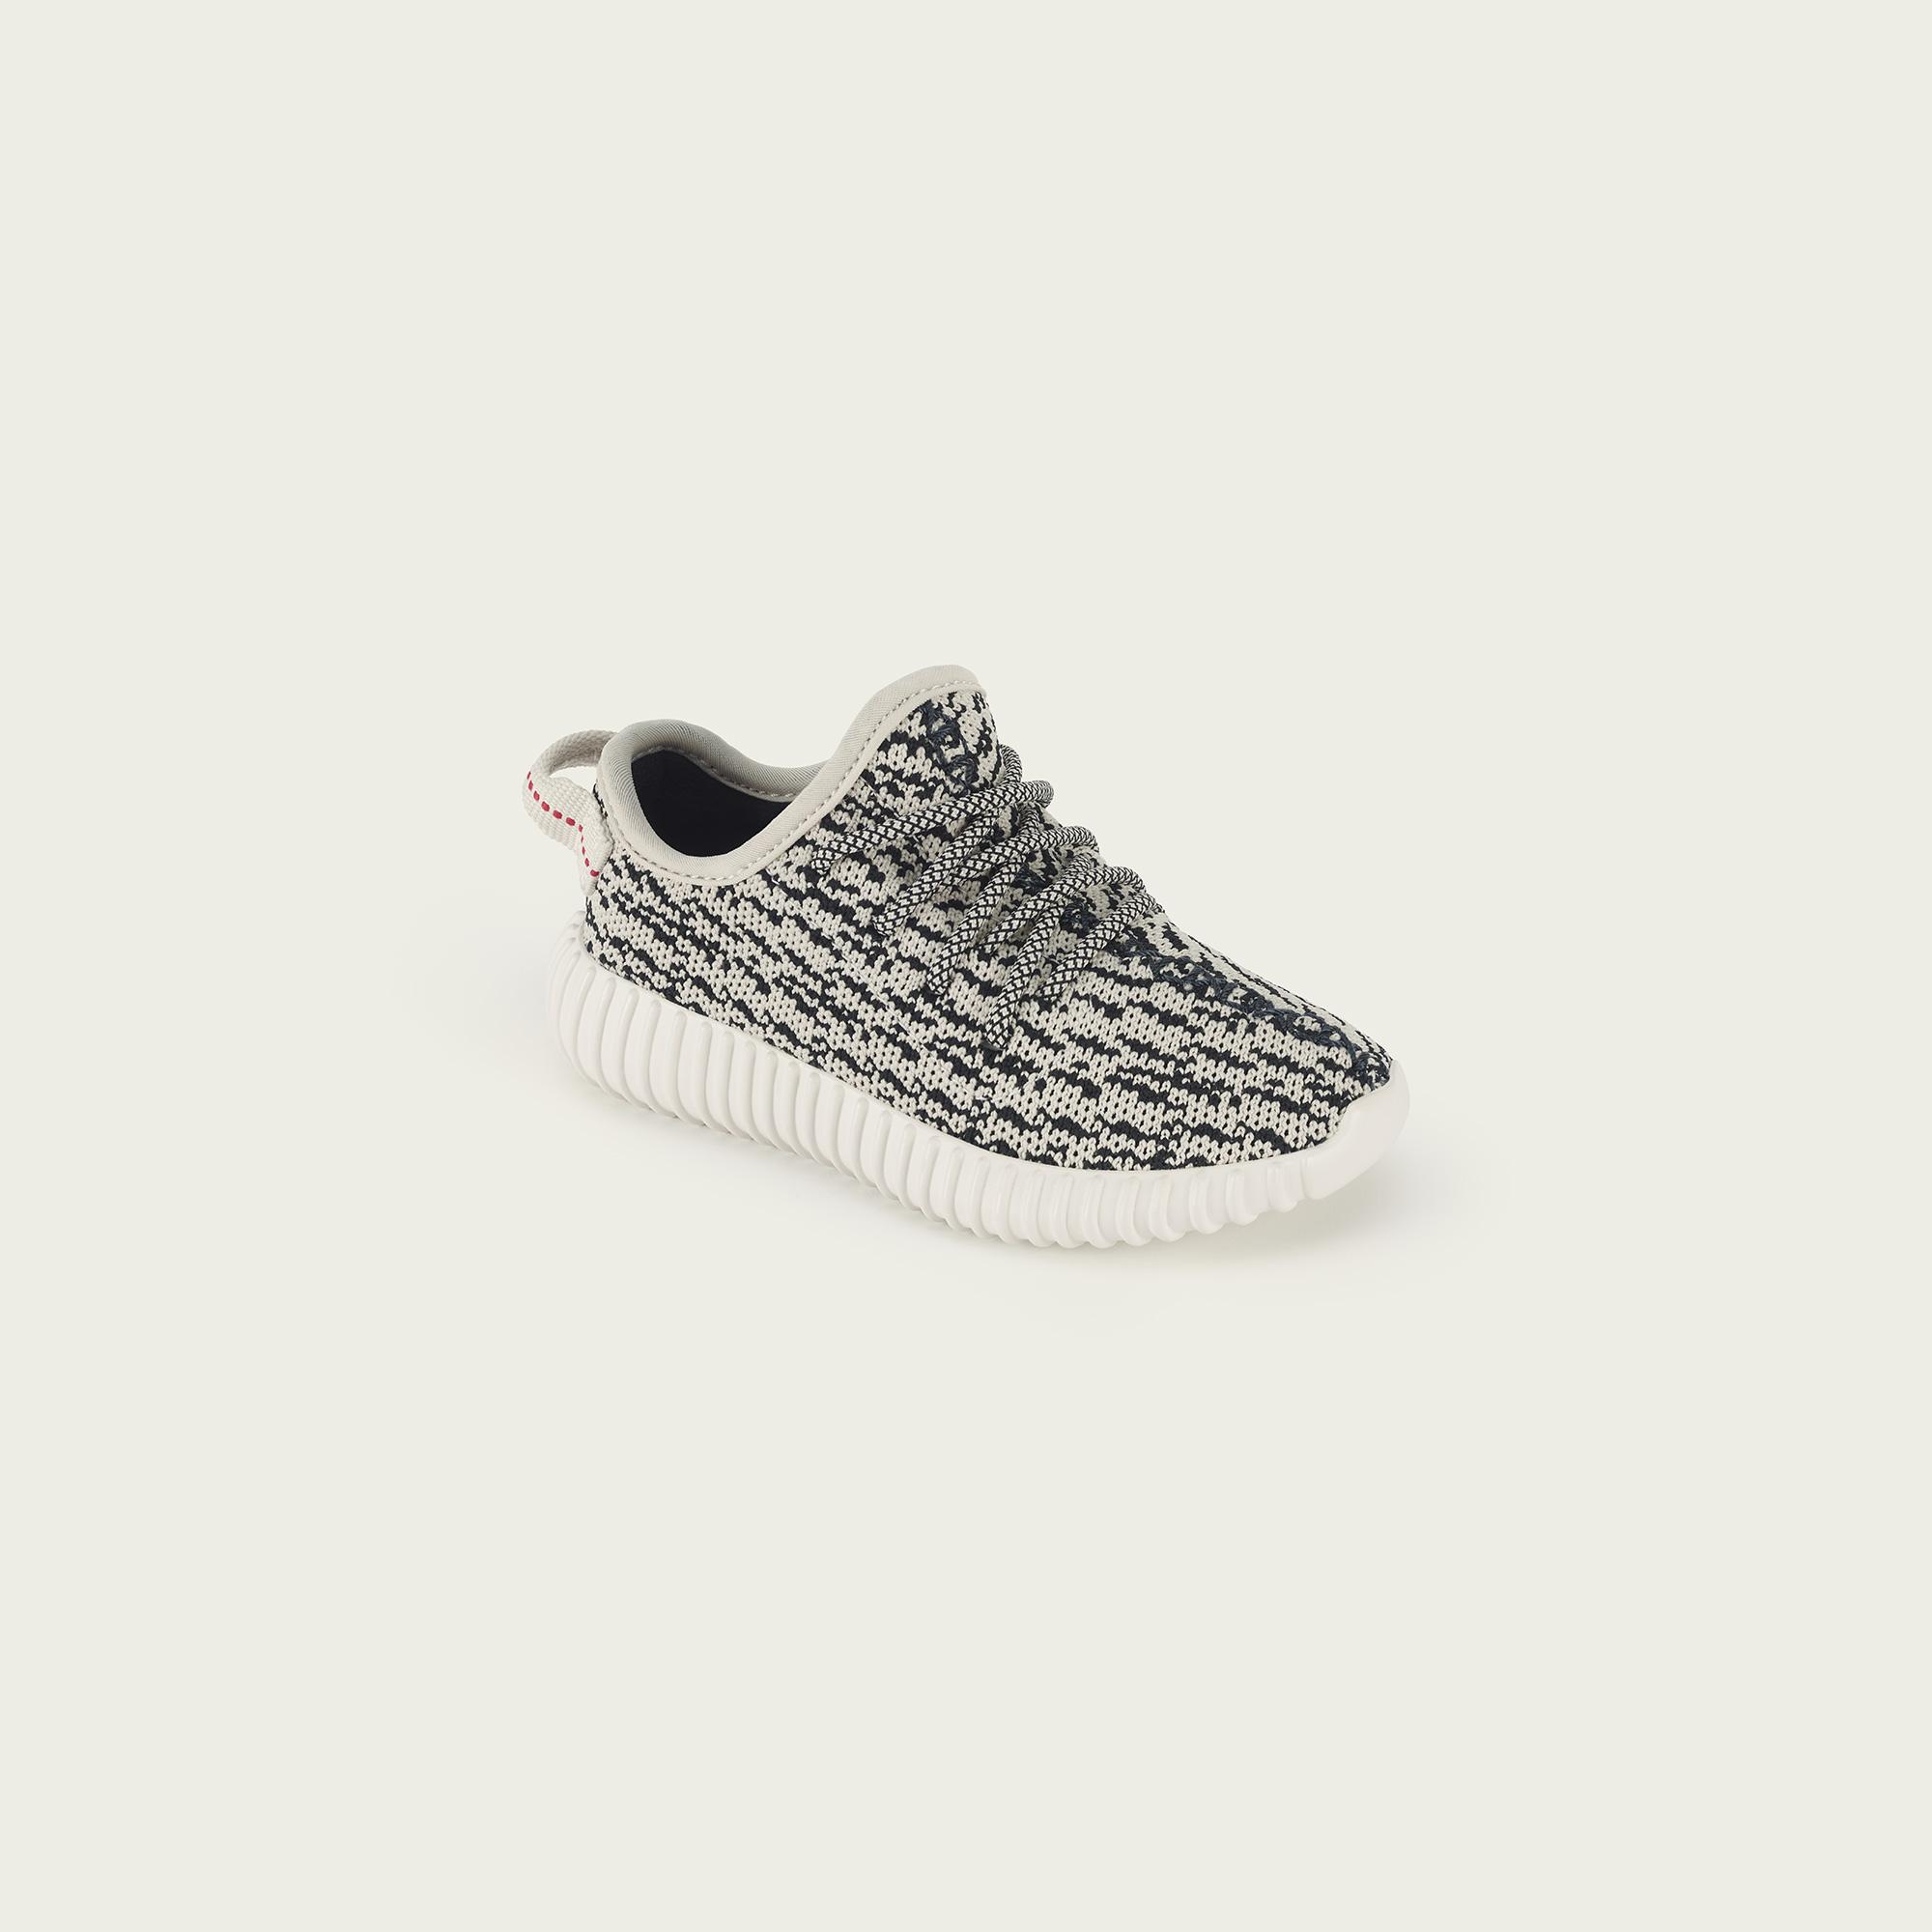 adidas yeezy black sole nike infant yeezy boost shoes